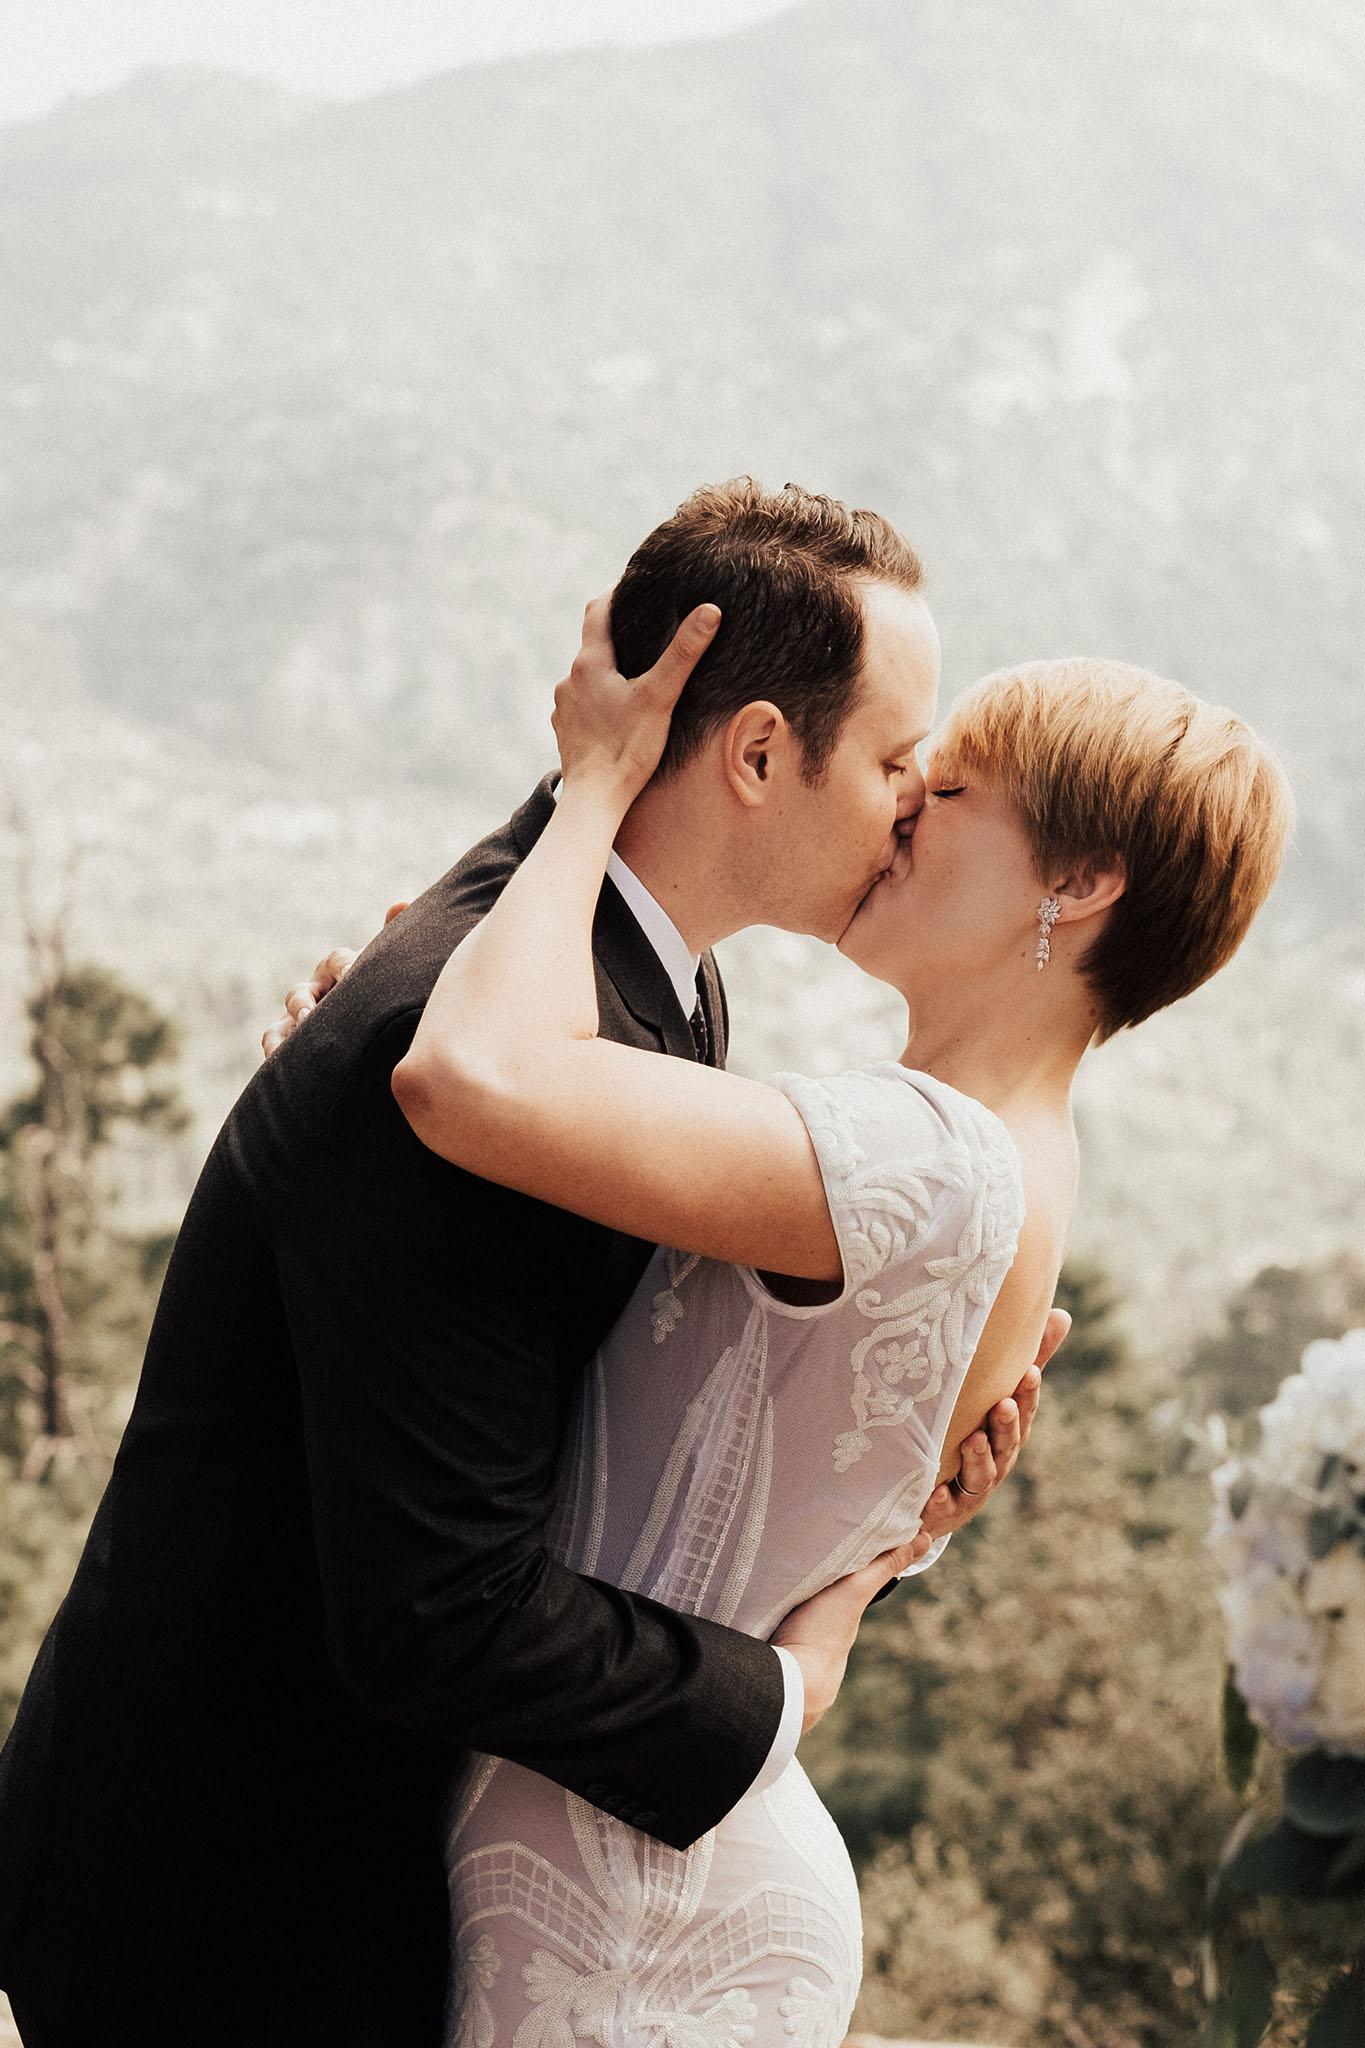 Arizona-Intimate-Elopement-Adventure-Photographer-Mount-Lemmon (11).jpg